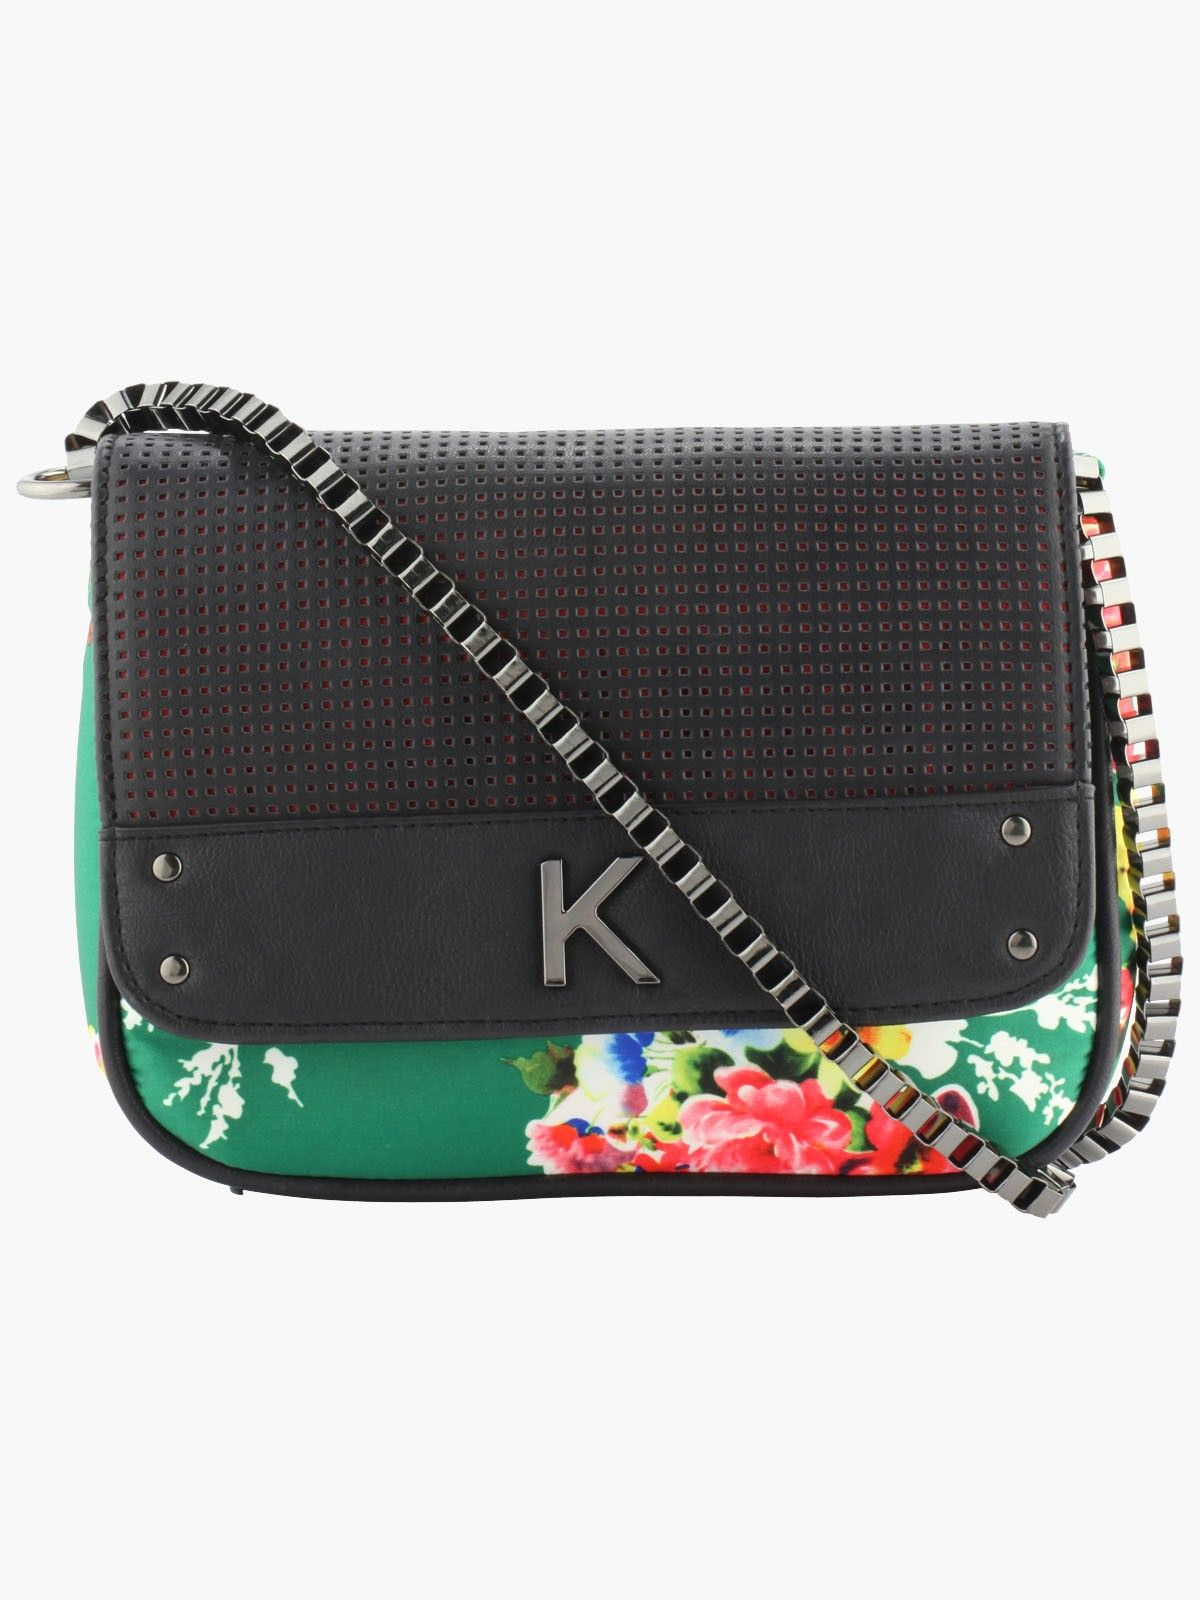 a586d01b5e SAC BANDOULIERE - K by kookai marques - MARQUES - SACS & ACCESSOIRES Sac  Femme Pas